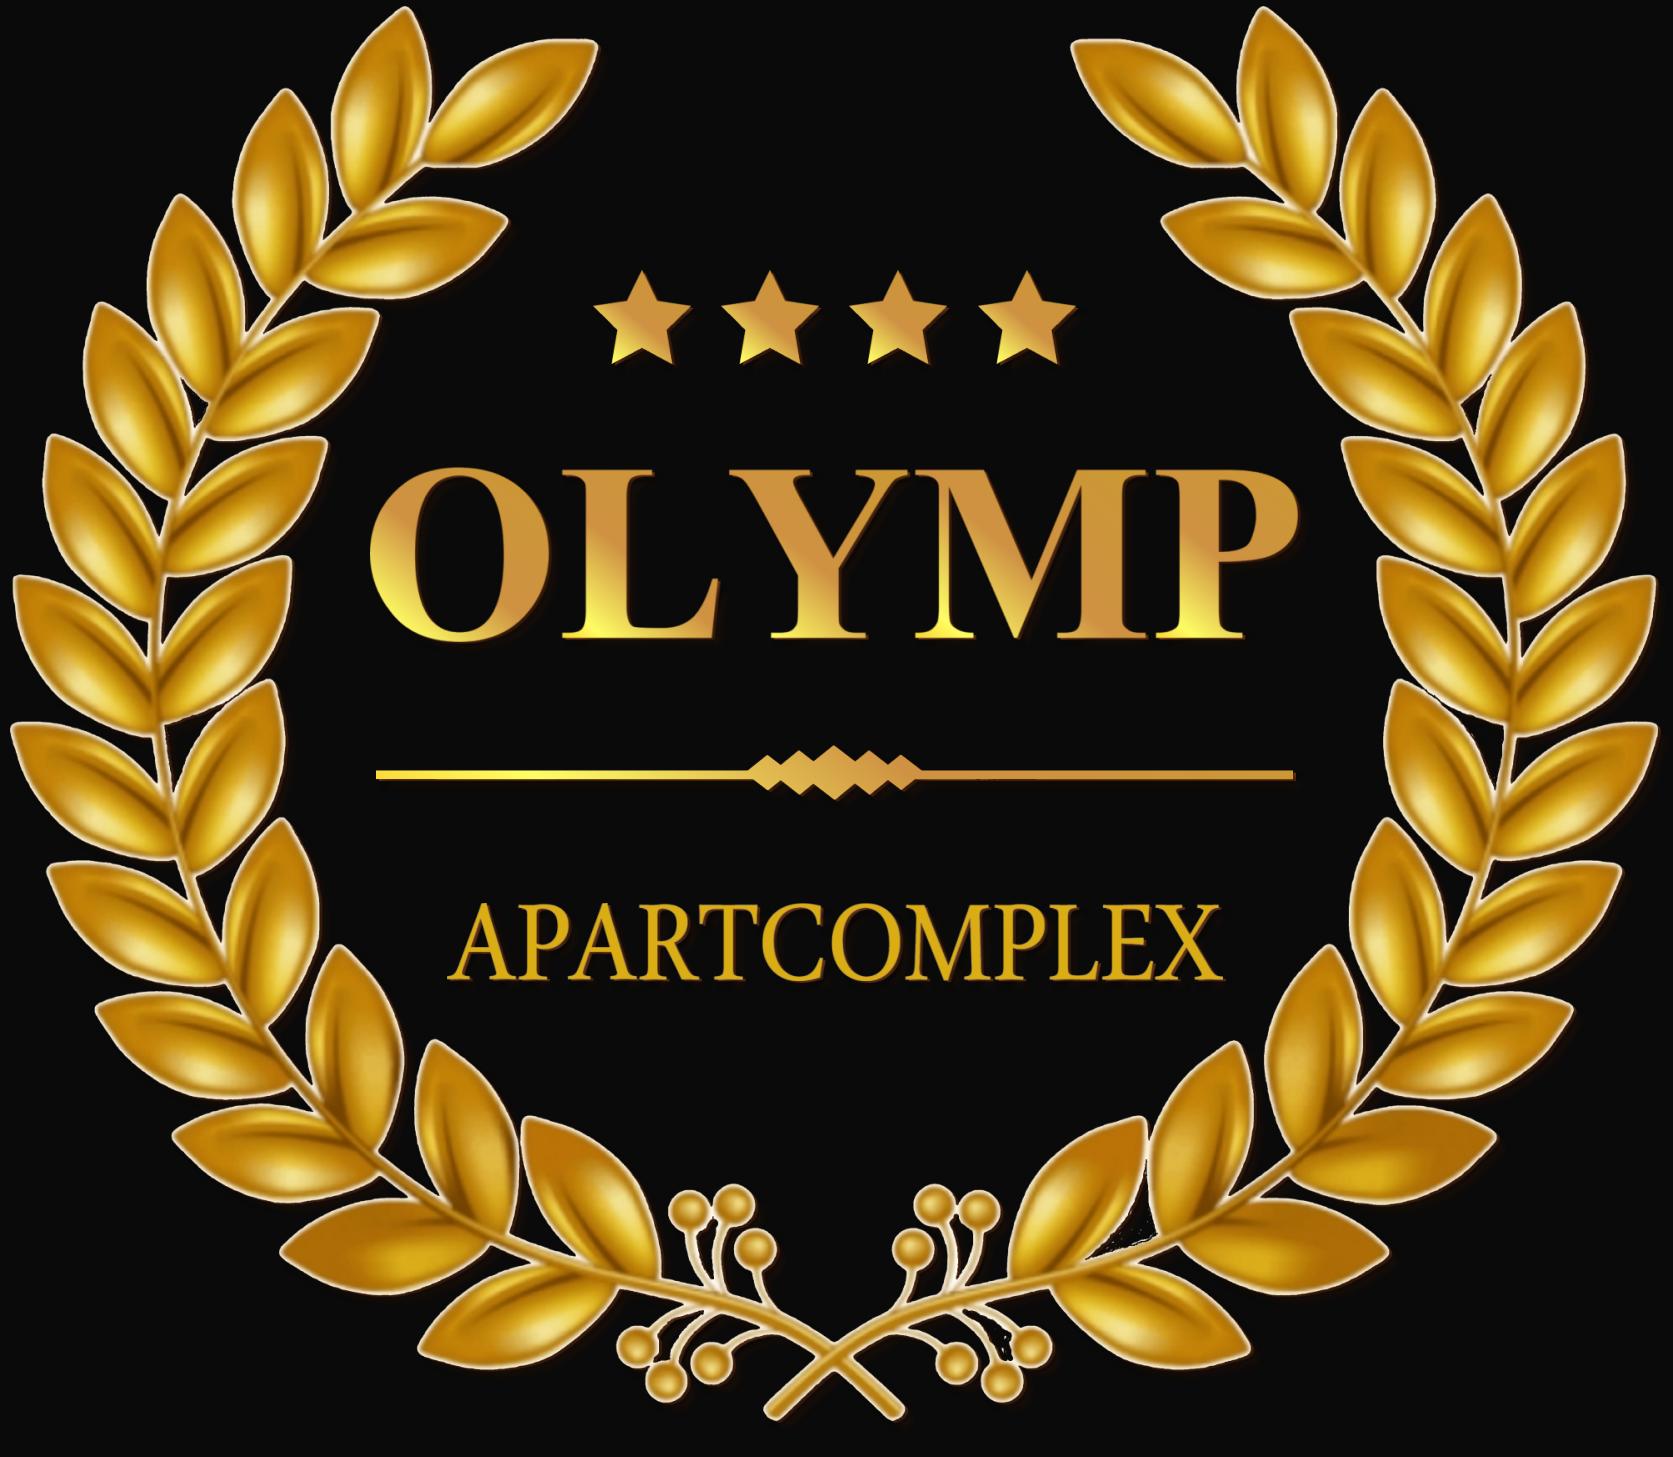 OLYMP APARTCOMPLEX SVETI VLAS BULGARIA